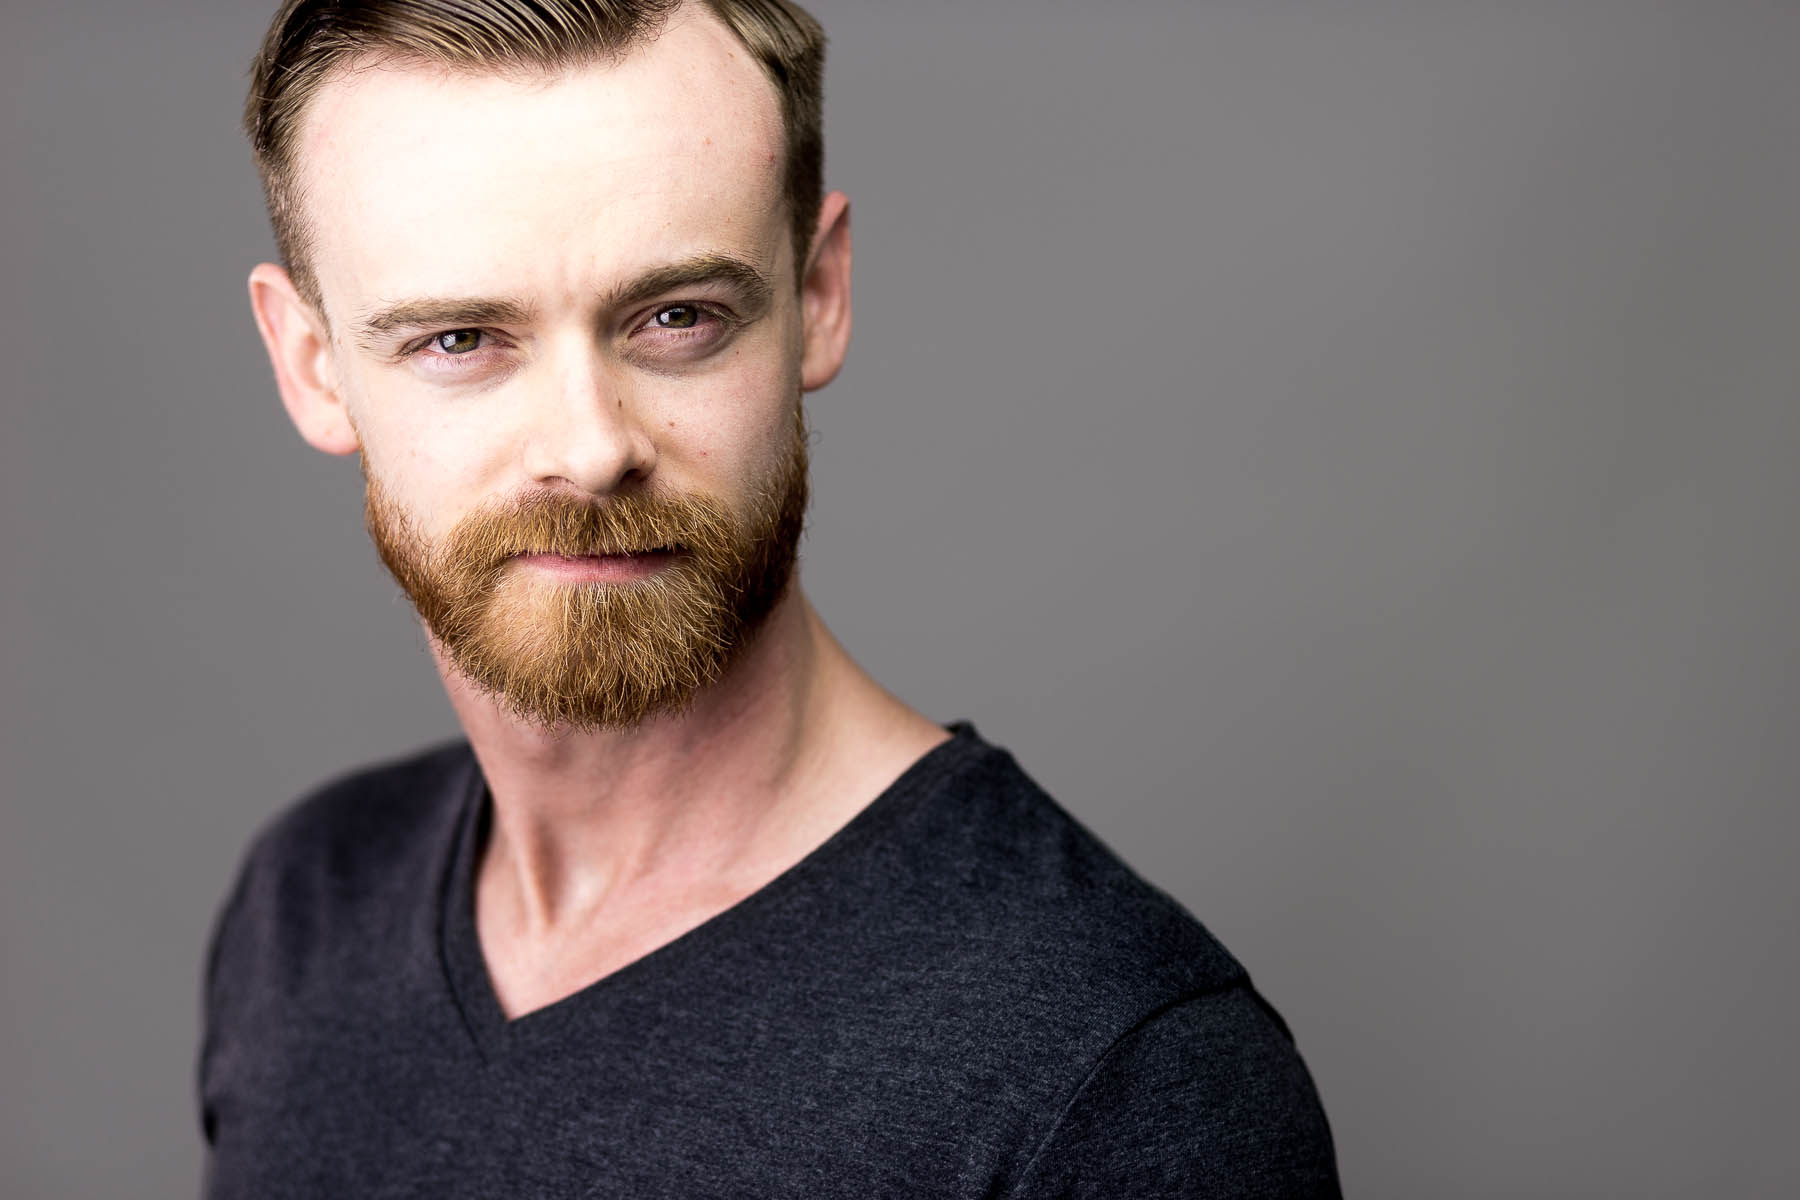 matt-actor-professional-headshot-session-7.jpg